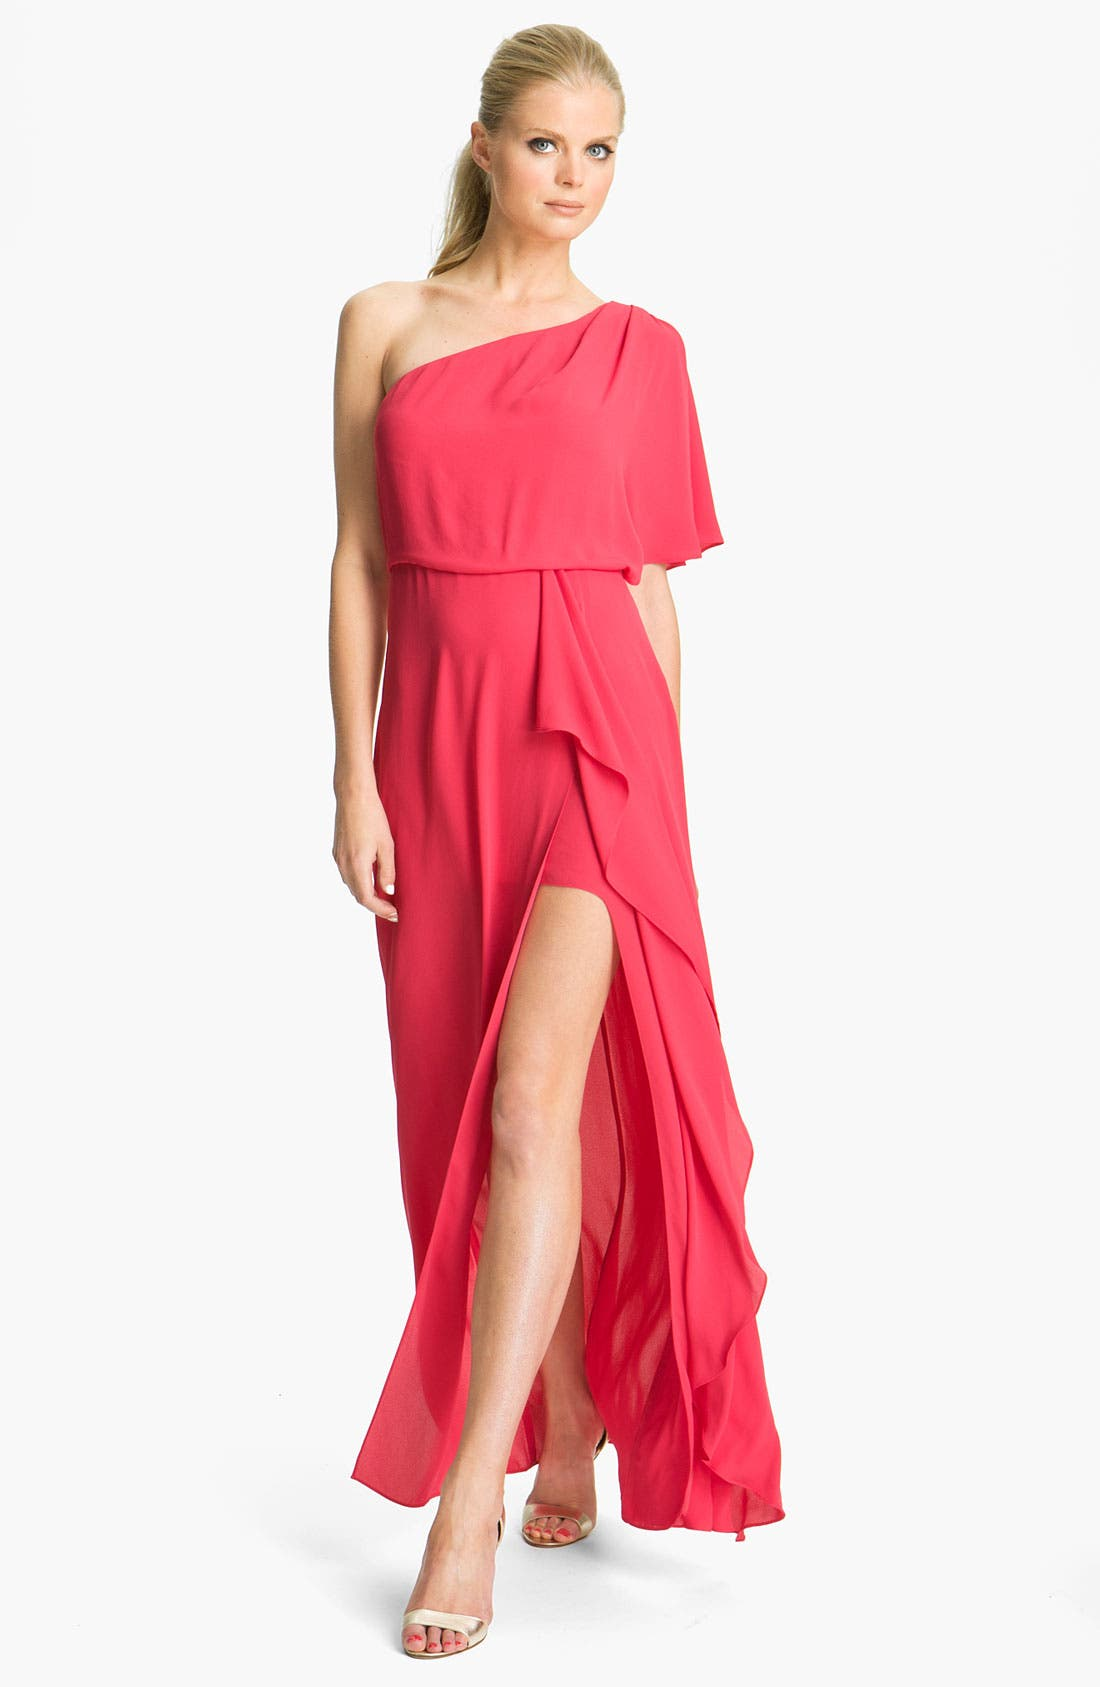 Main Image - BCBGMAXAZRIA 'Kendal' One Shoulder Chiffon Gown